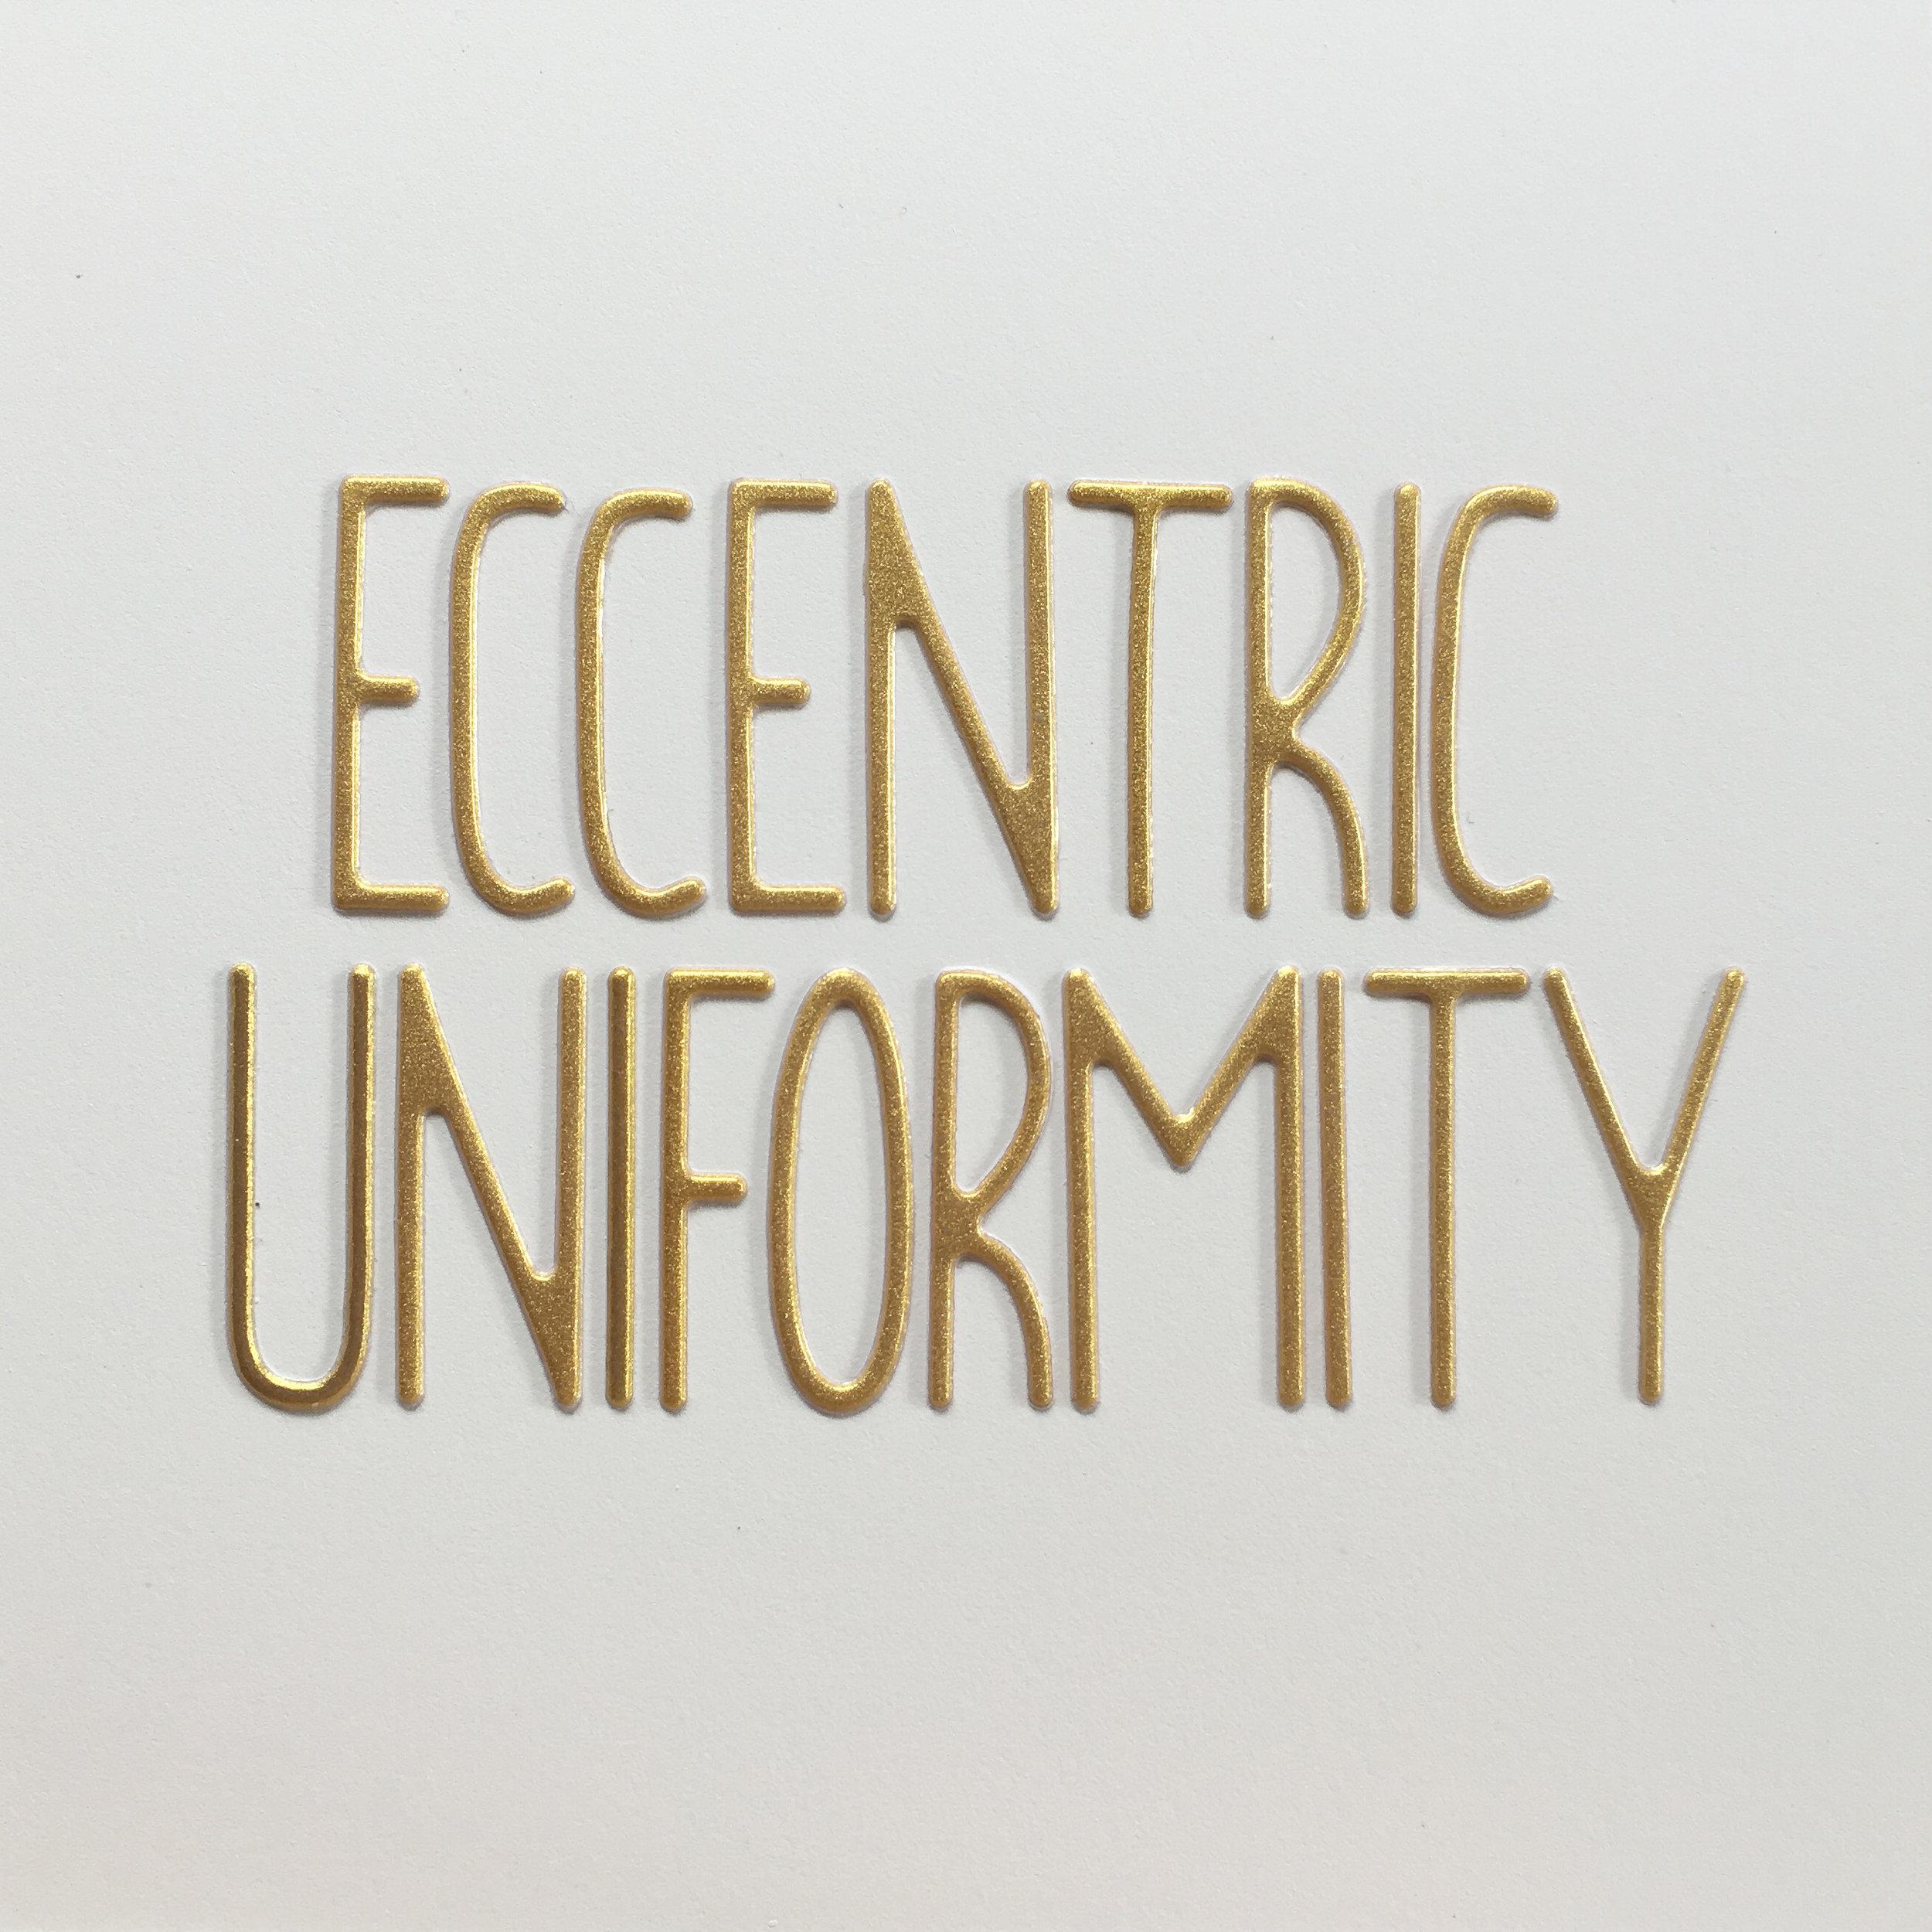 eccentric uniformity.jpg